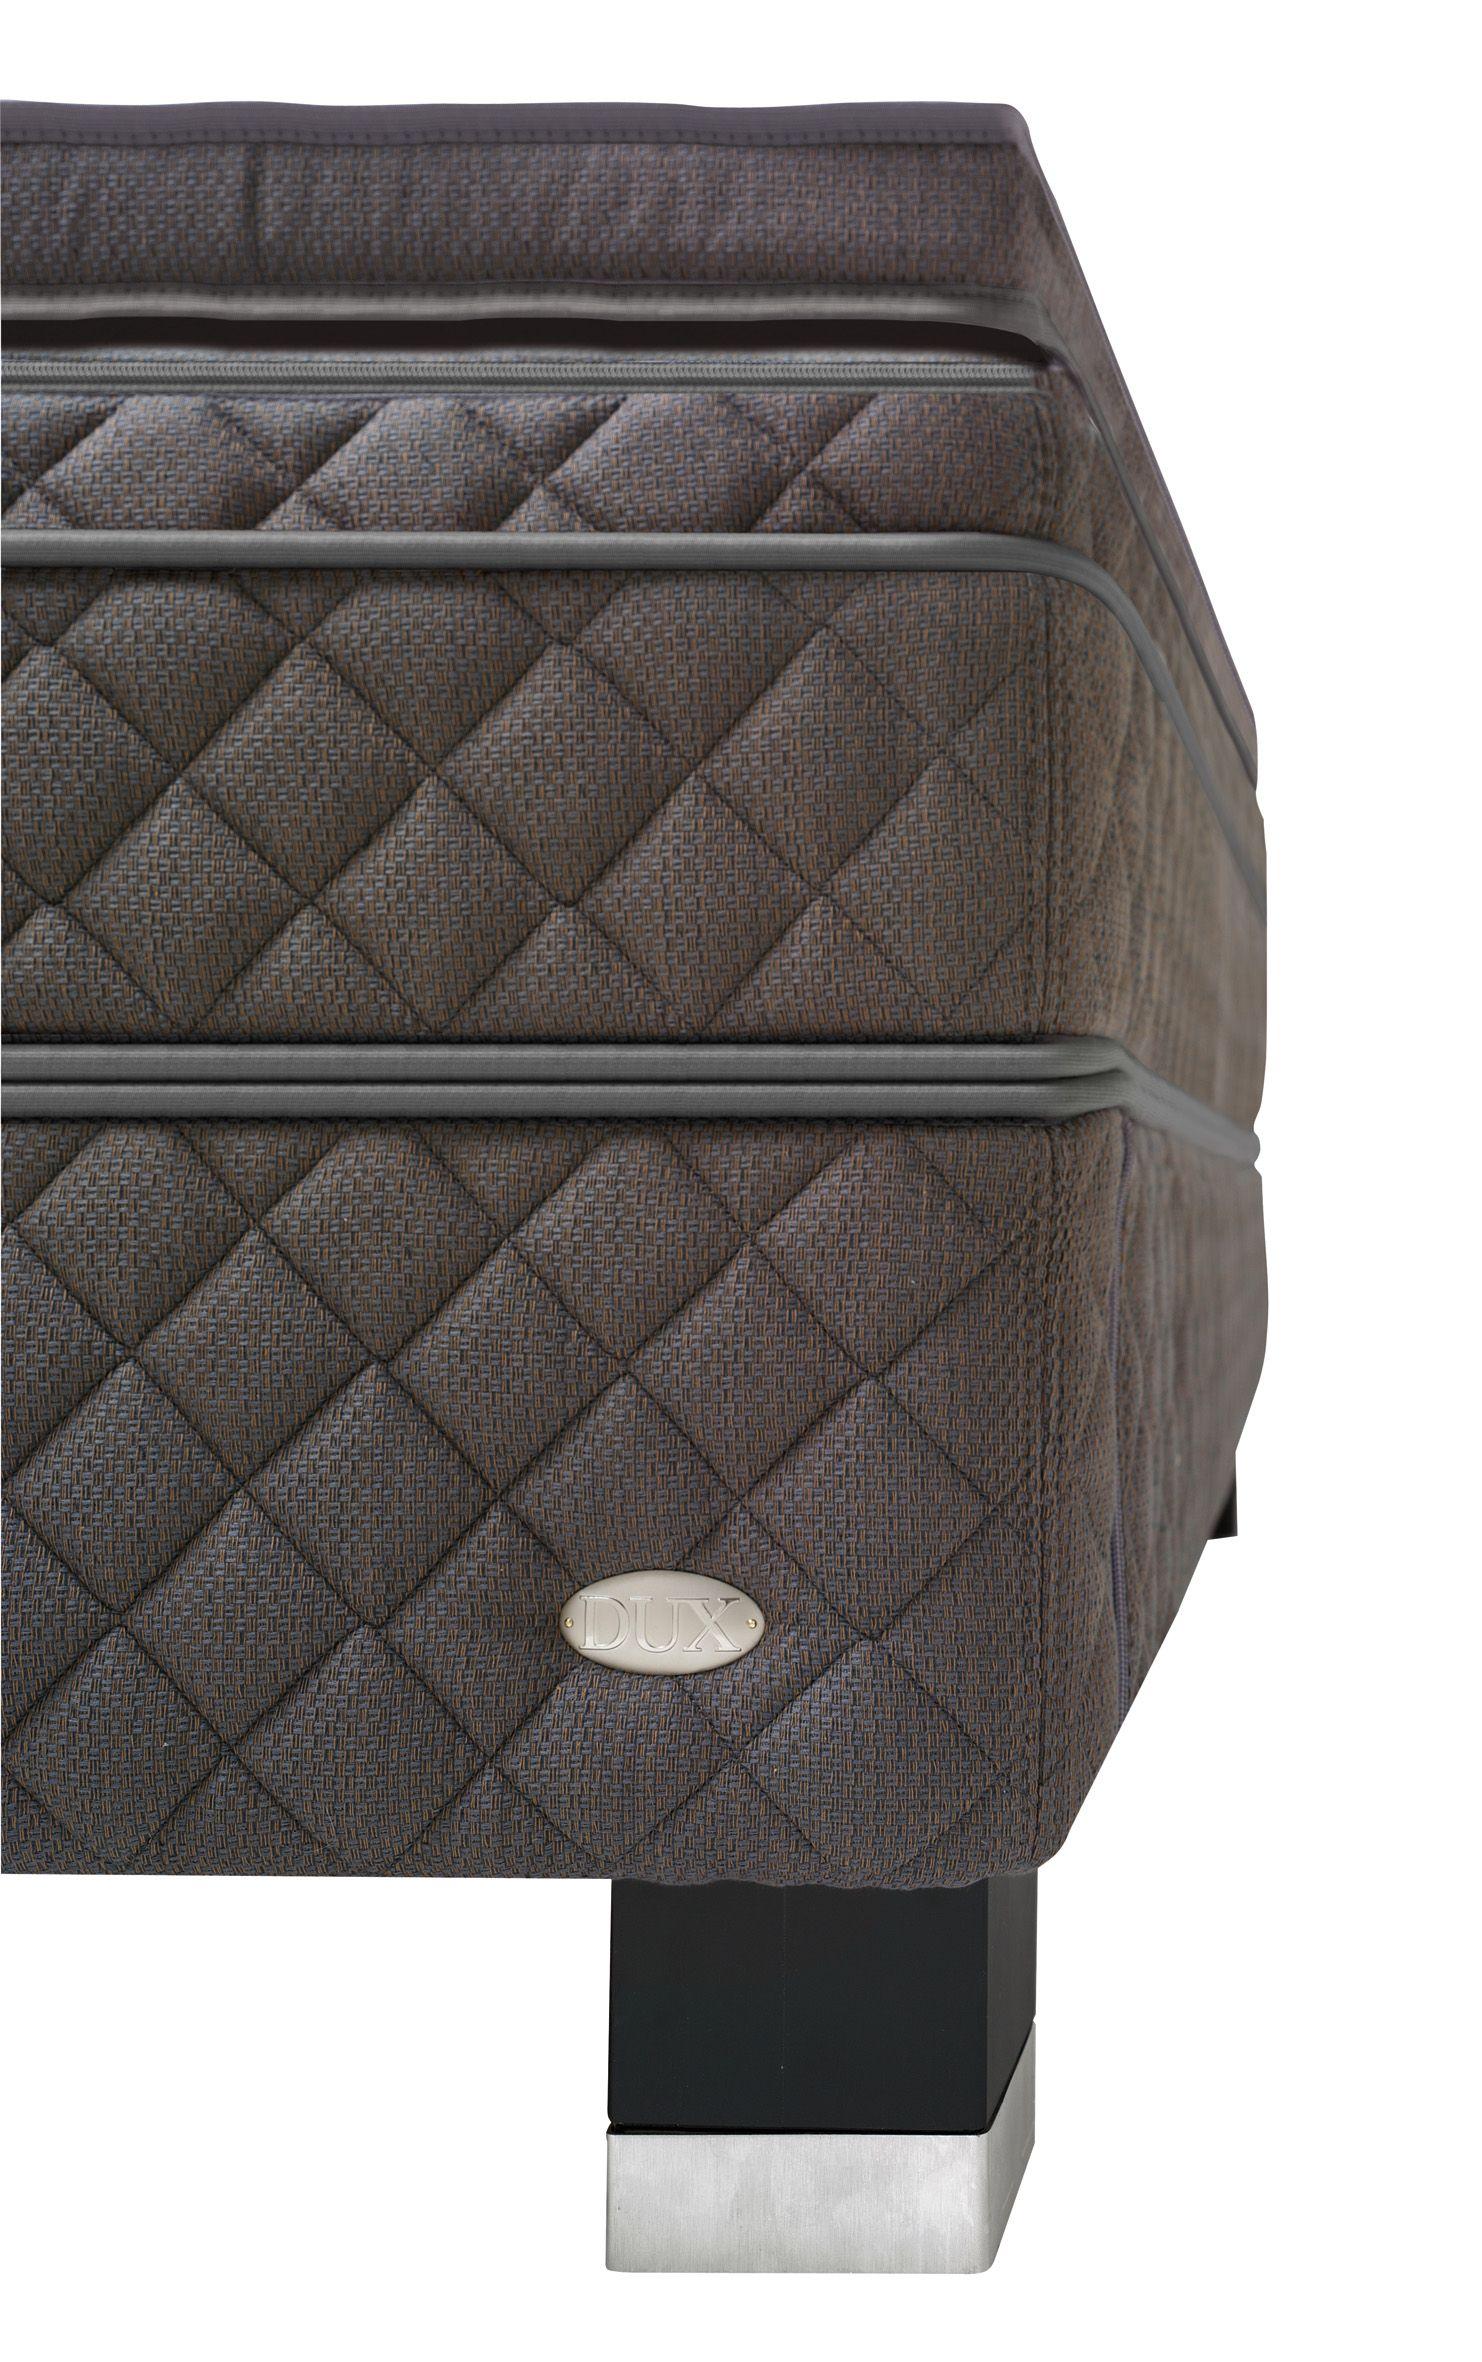 dux 818 topmodellen fra dux dux senge pinterest mattress and